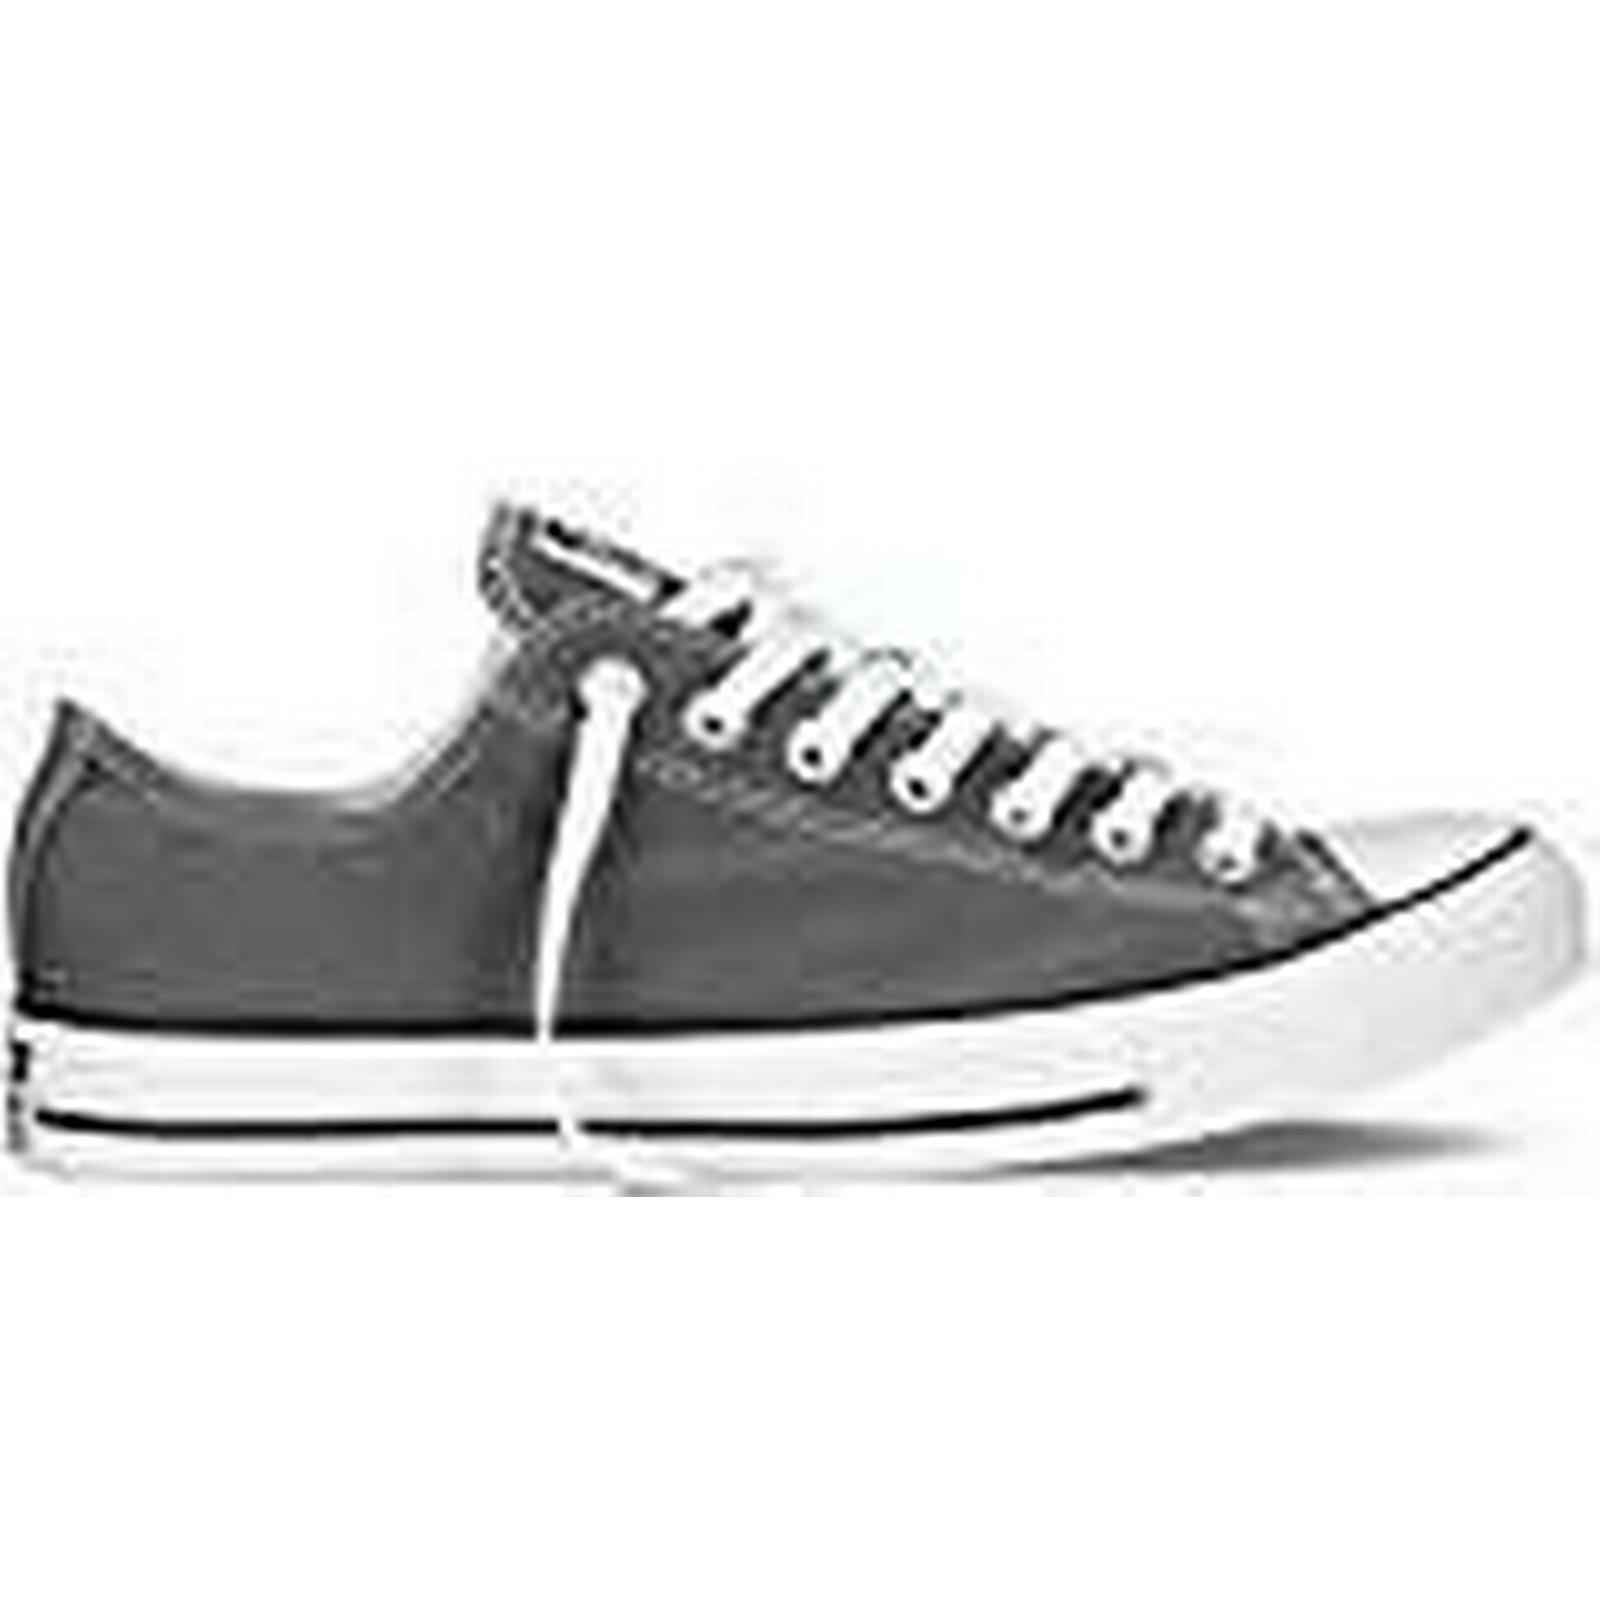 Converse 1J794C, Unisex Adults' Low-Top (44 Sneakers, Gray (Charcoal), 10 (44 Low-Top EU) 112c63